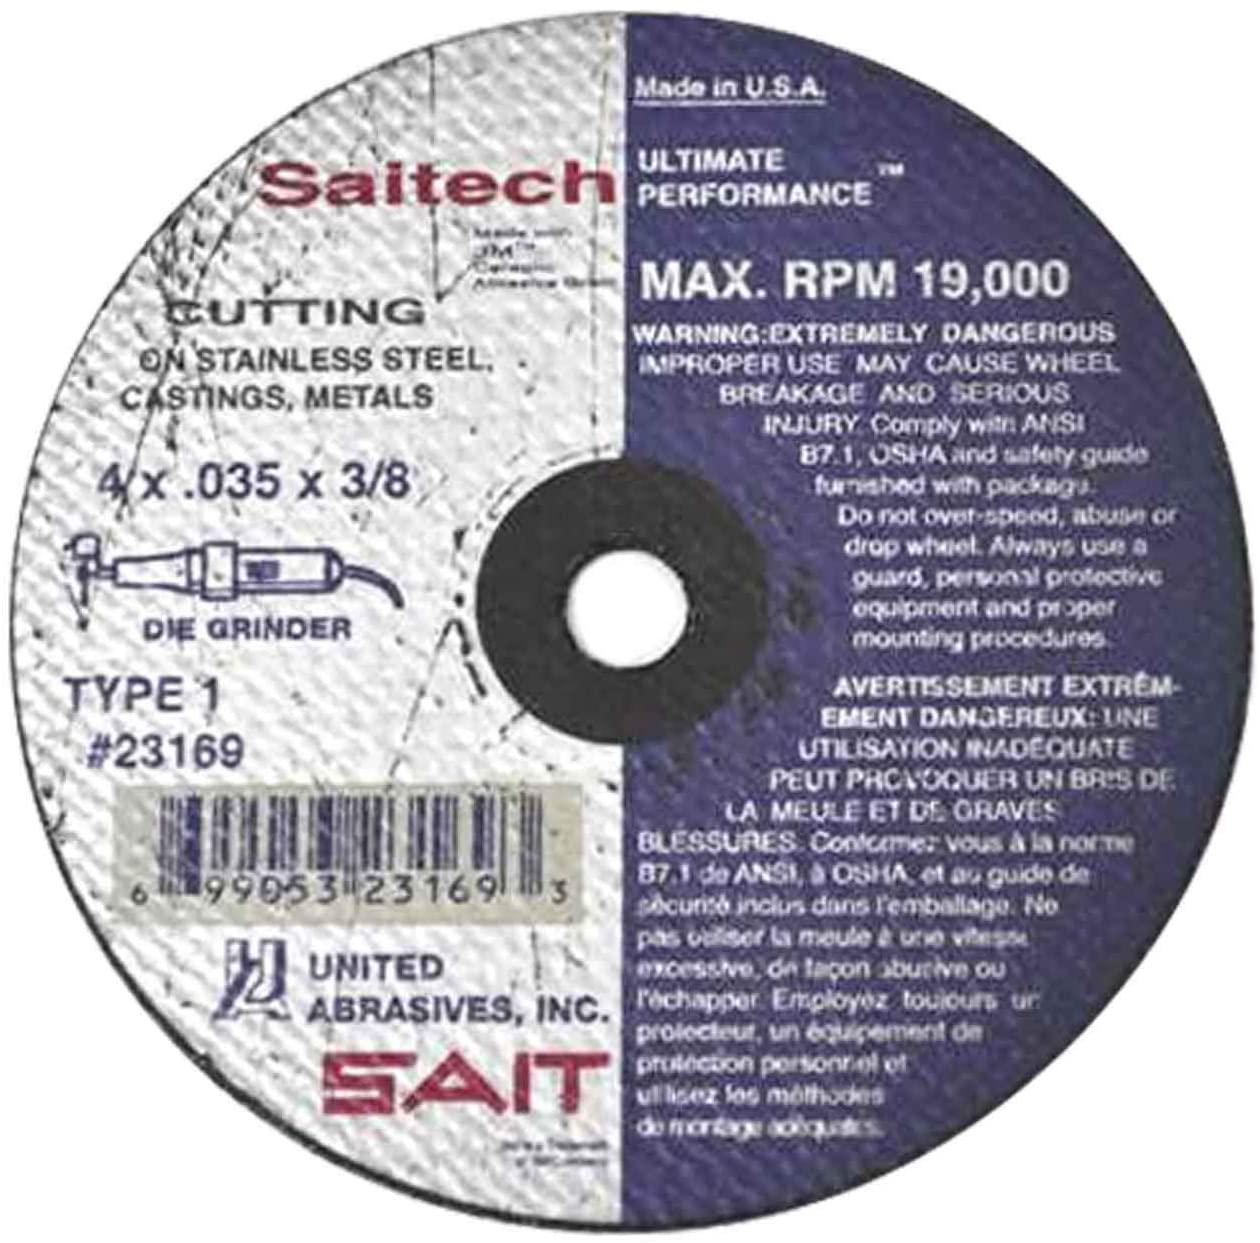 United Abrasives SAIT 23169 4x.035x3/8 Saitech Ultimate Performance Premium Cut-off Wheels, 100 pack